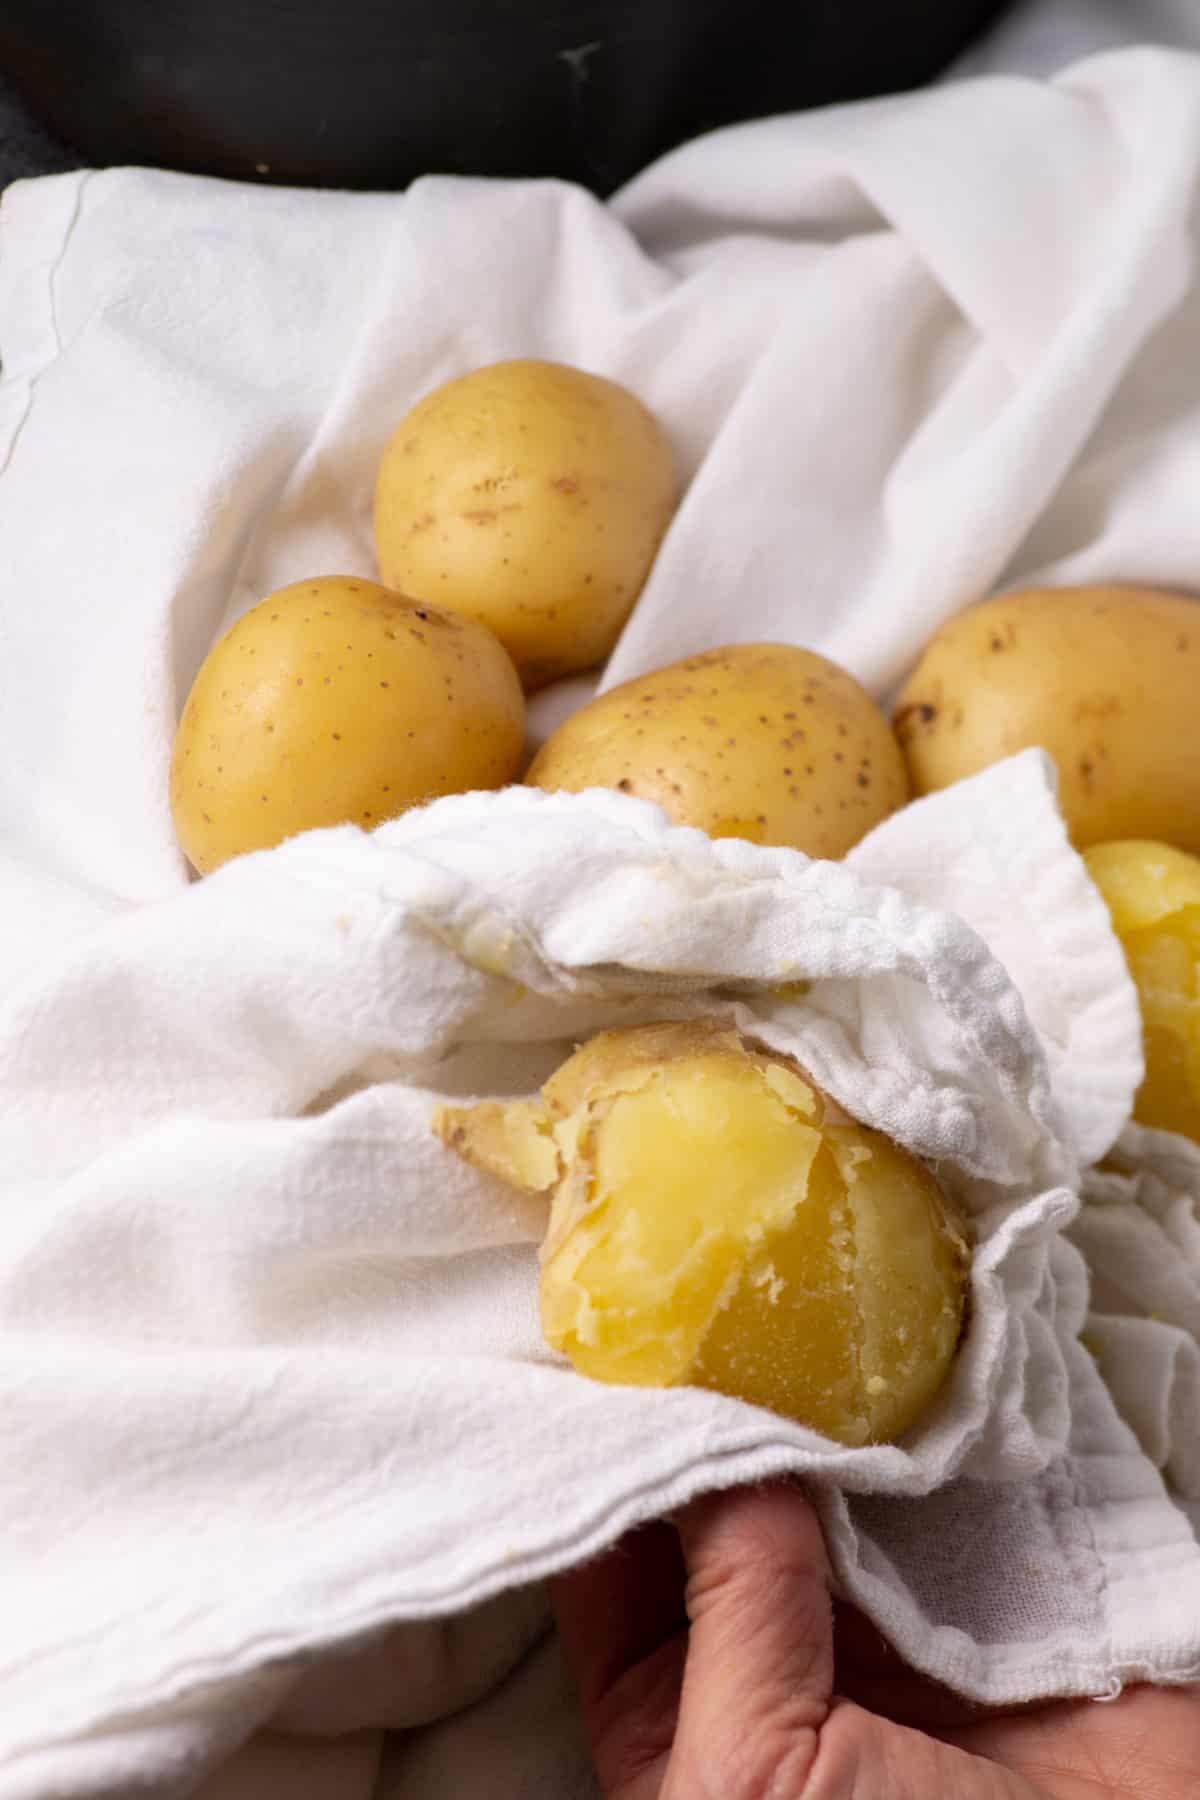 Rubbing the skin off potatoes